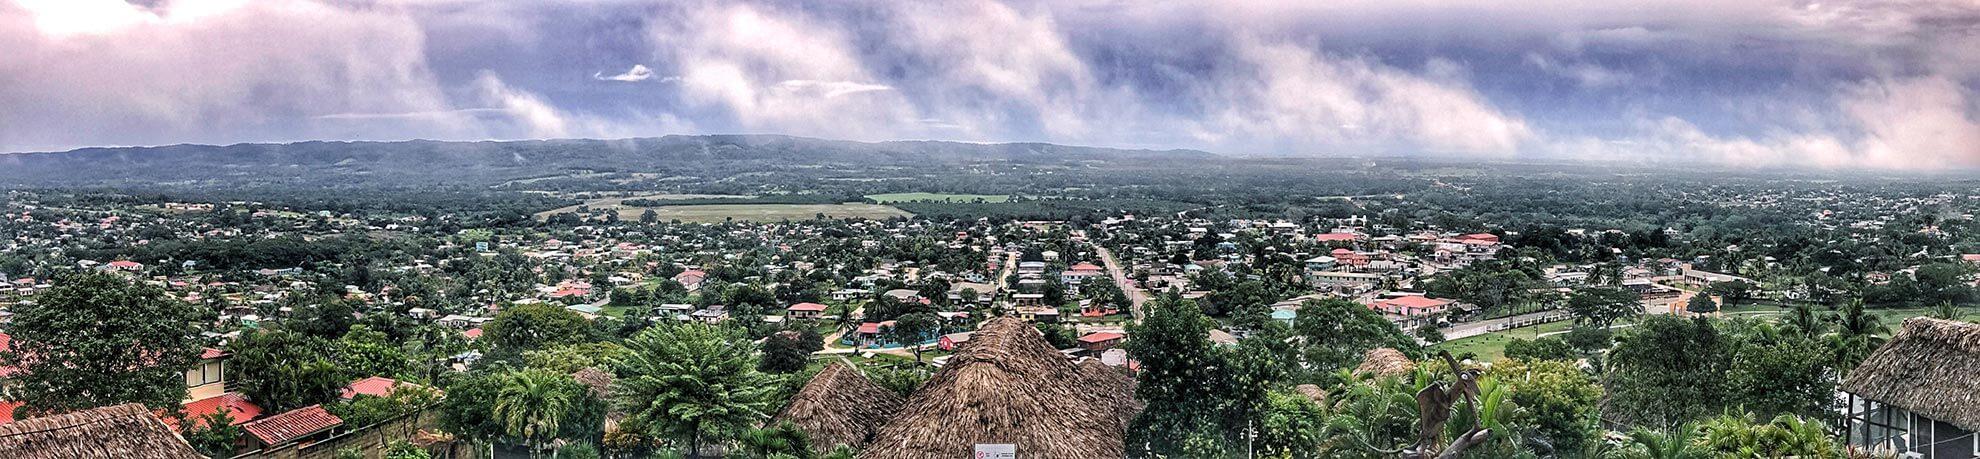 Belizean Town